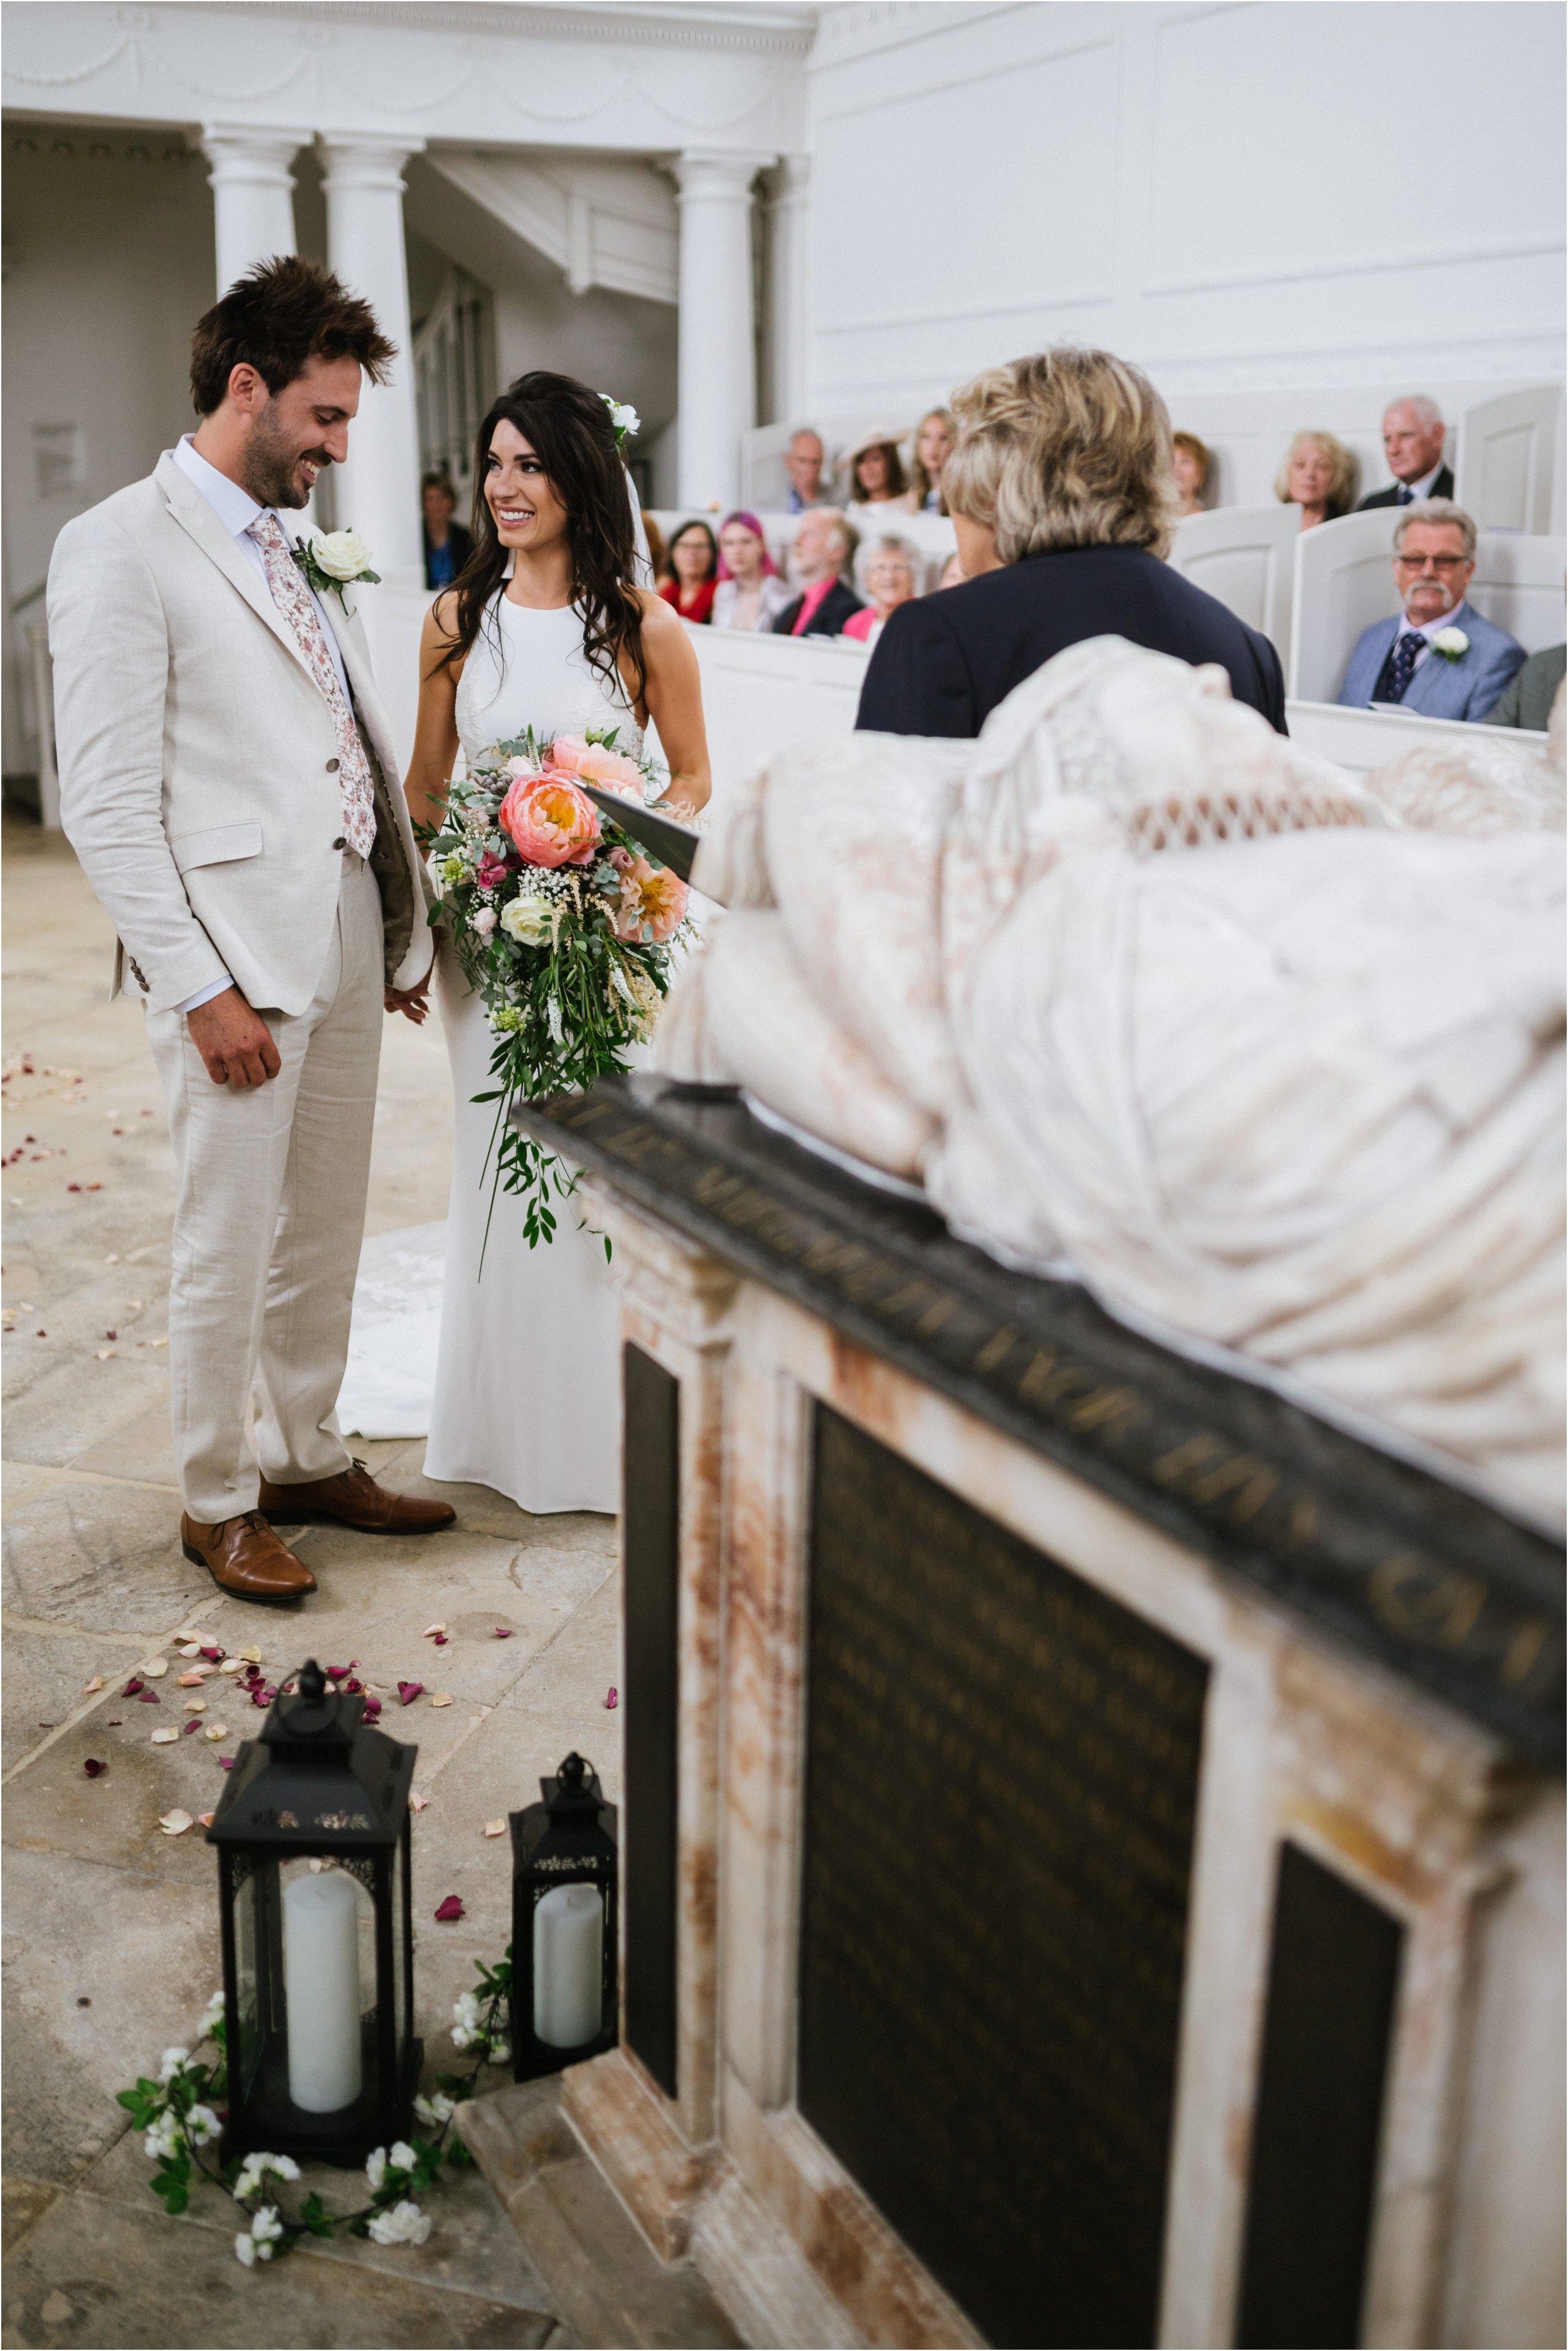 Compton Verney wedding photography_0056.jpg